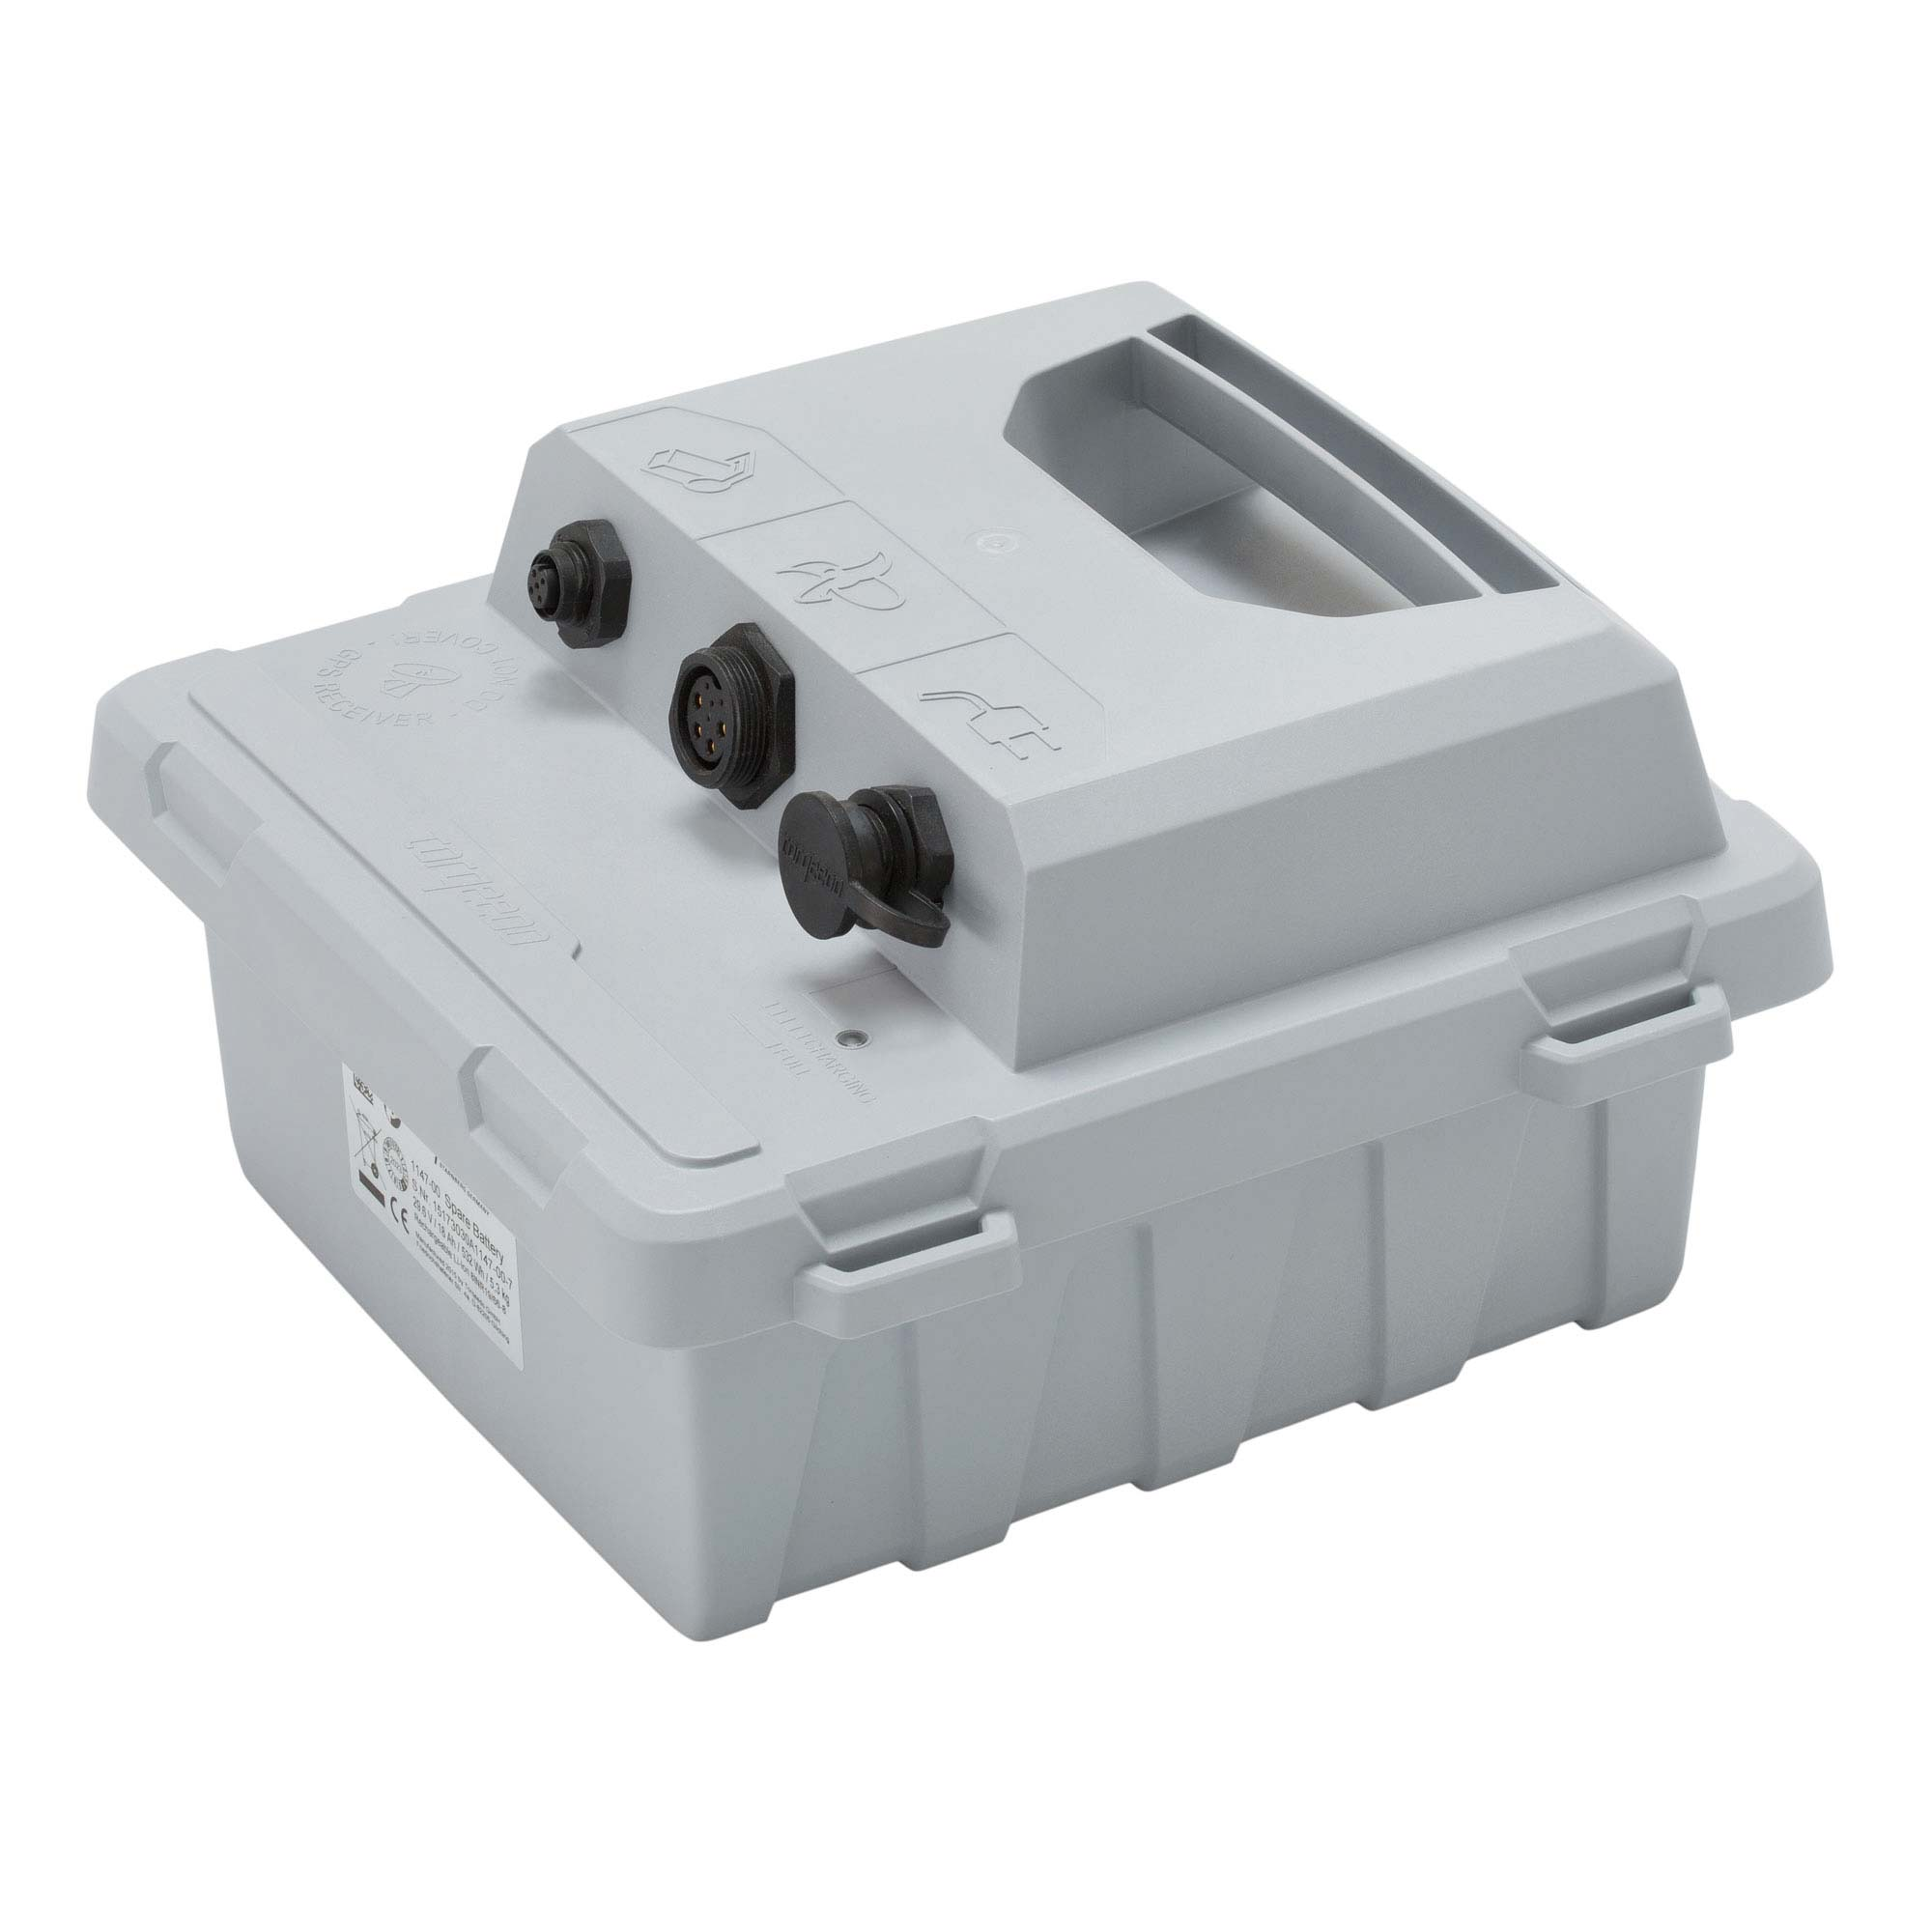 Torqeedo Battery Ultralight 403 - 915 Wh